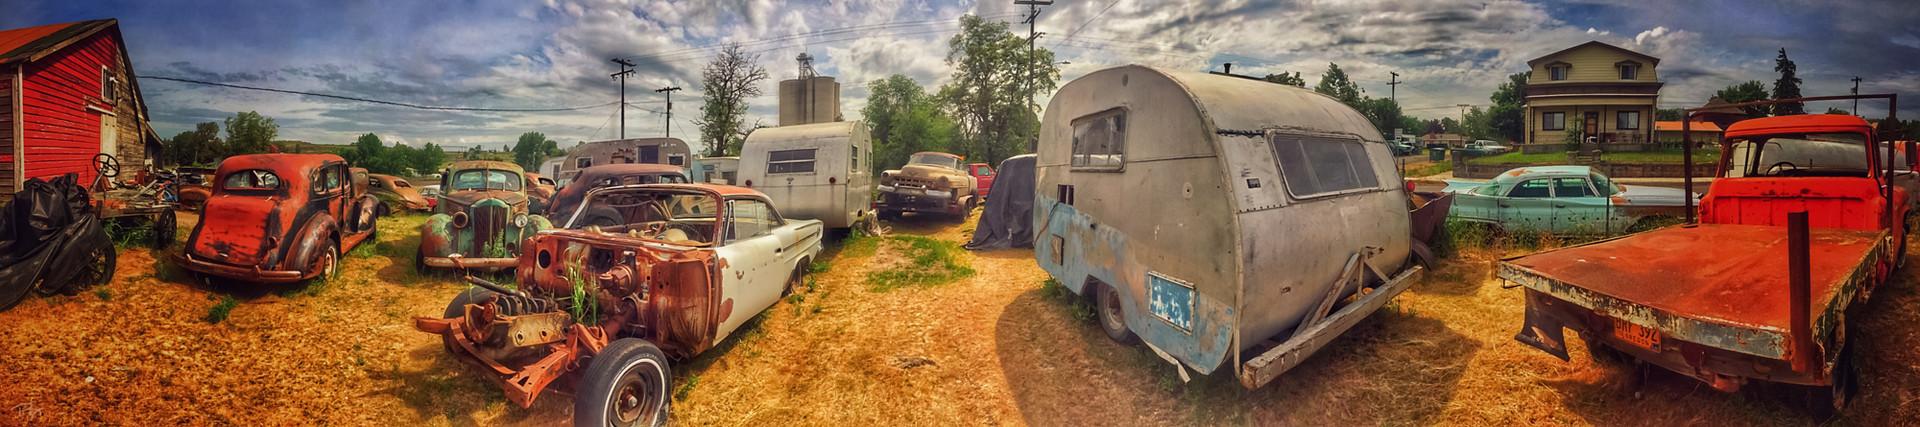 Vintage Car Graveyard